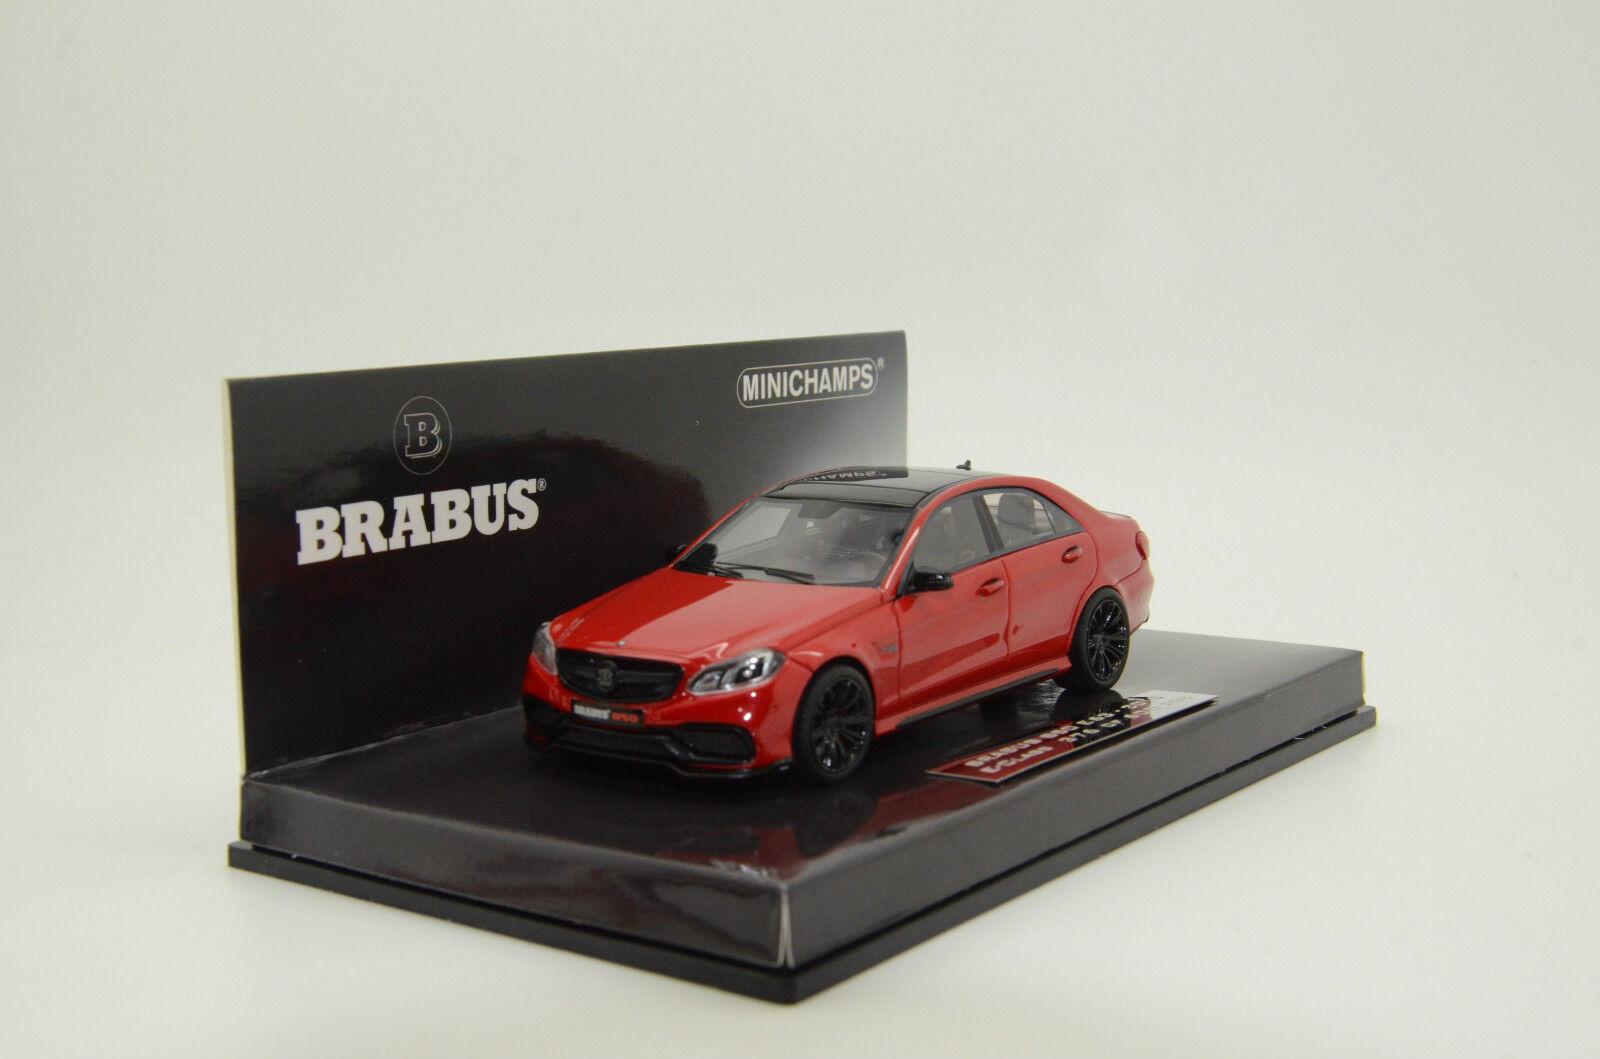 nuevo listado Mercedes Brabus Brabus Brabus 850 E63 clase e 2015 Rojo Metálico Minichamps 034100 1 43  precio al por mayor